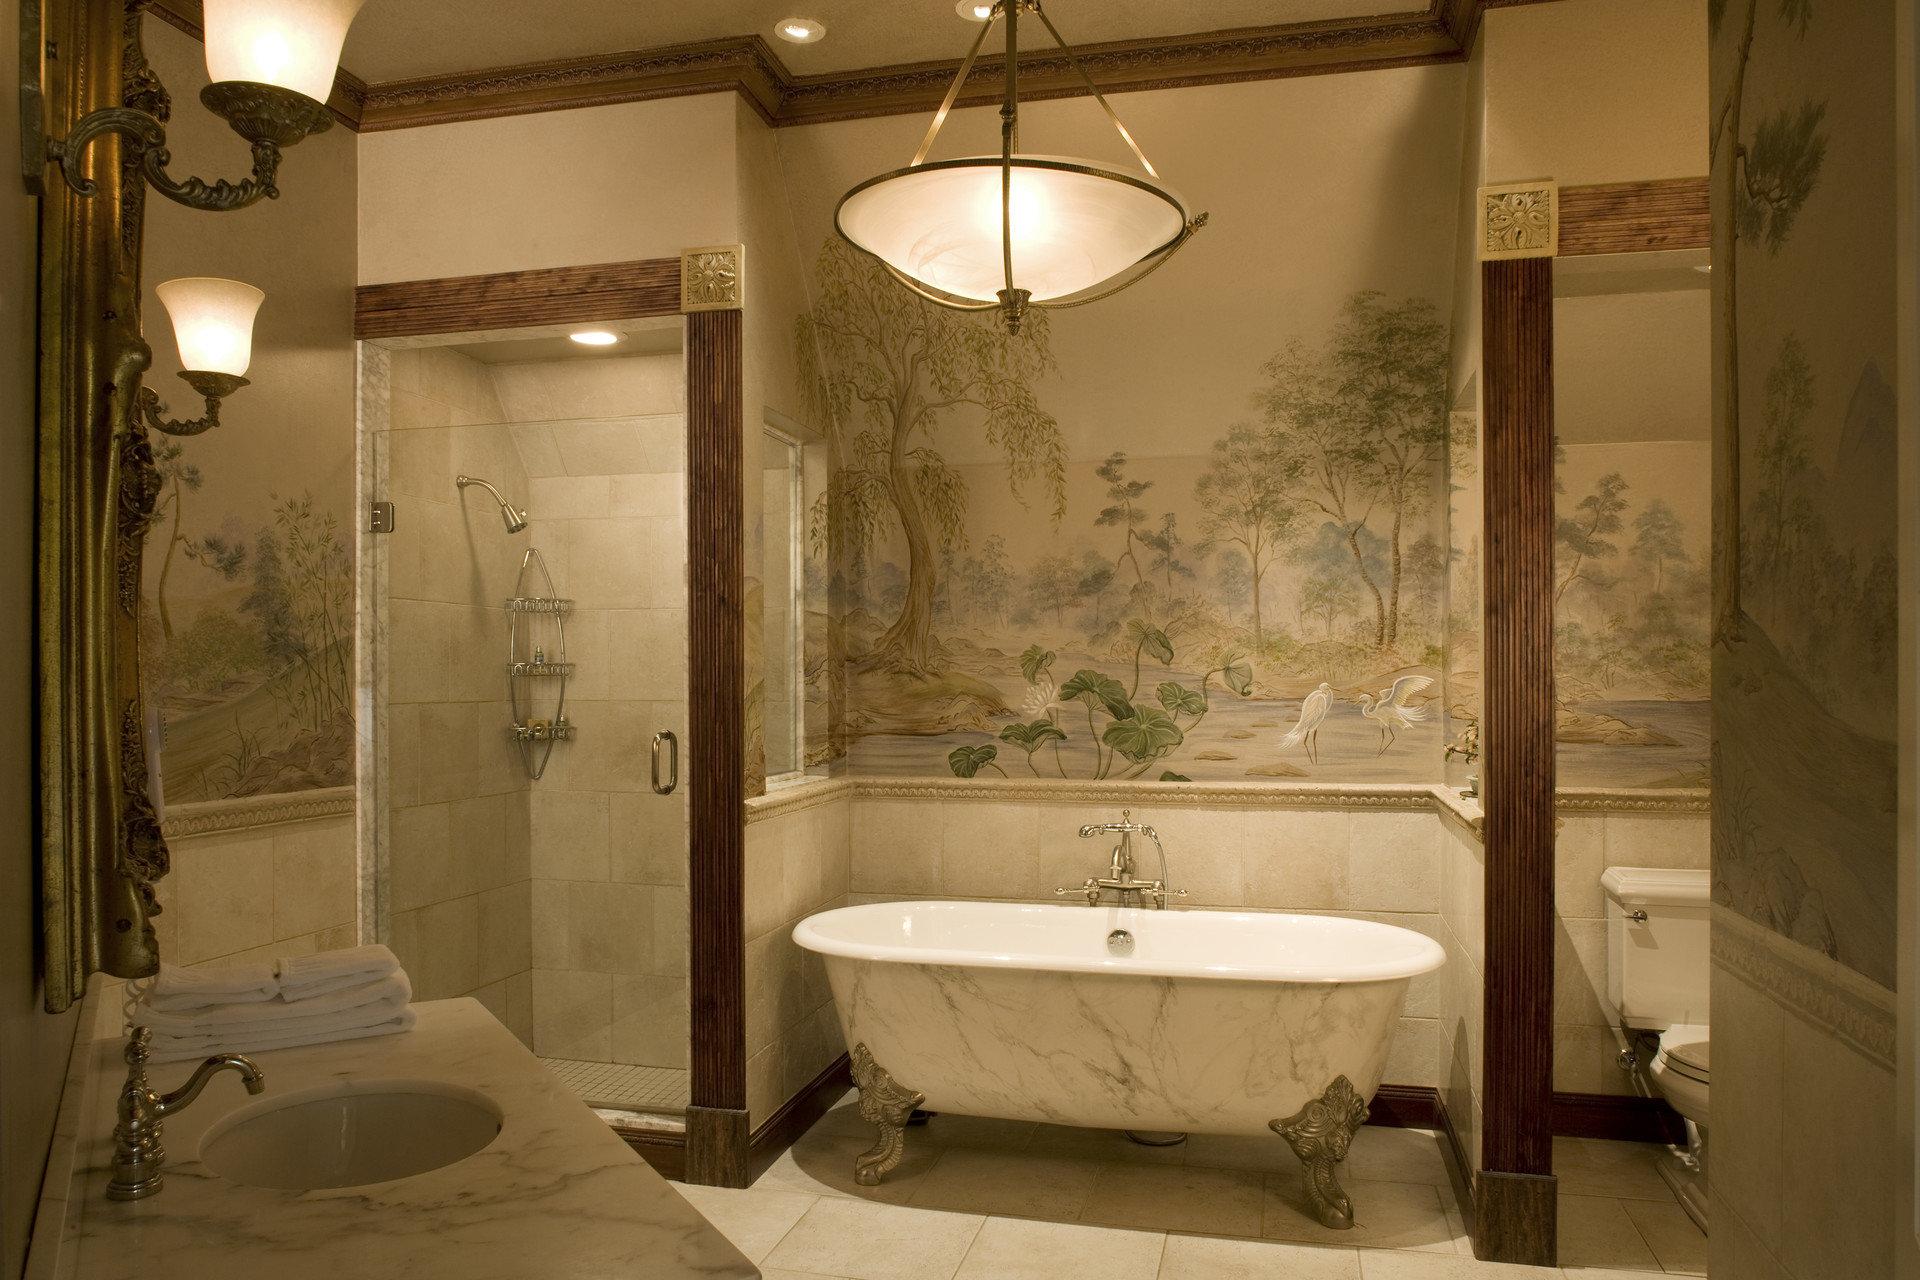 Trip Ideas indoor bathroom wall room sink plumbing fixture interior design floor estate white bathtub home toilet Design Suite tub Bath tiled